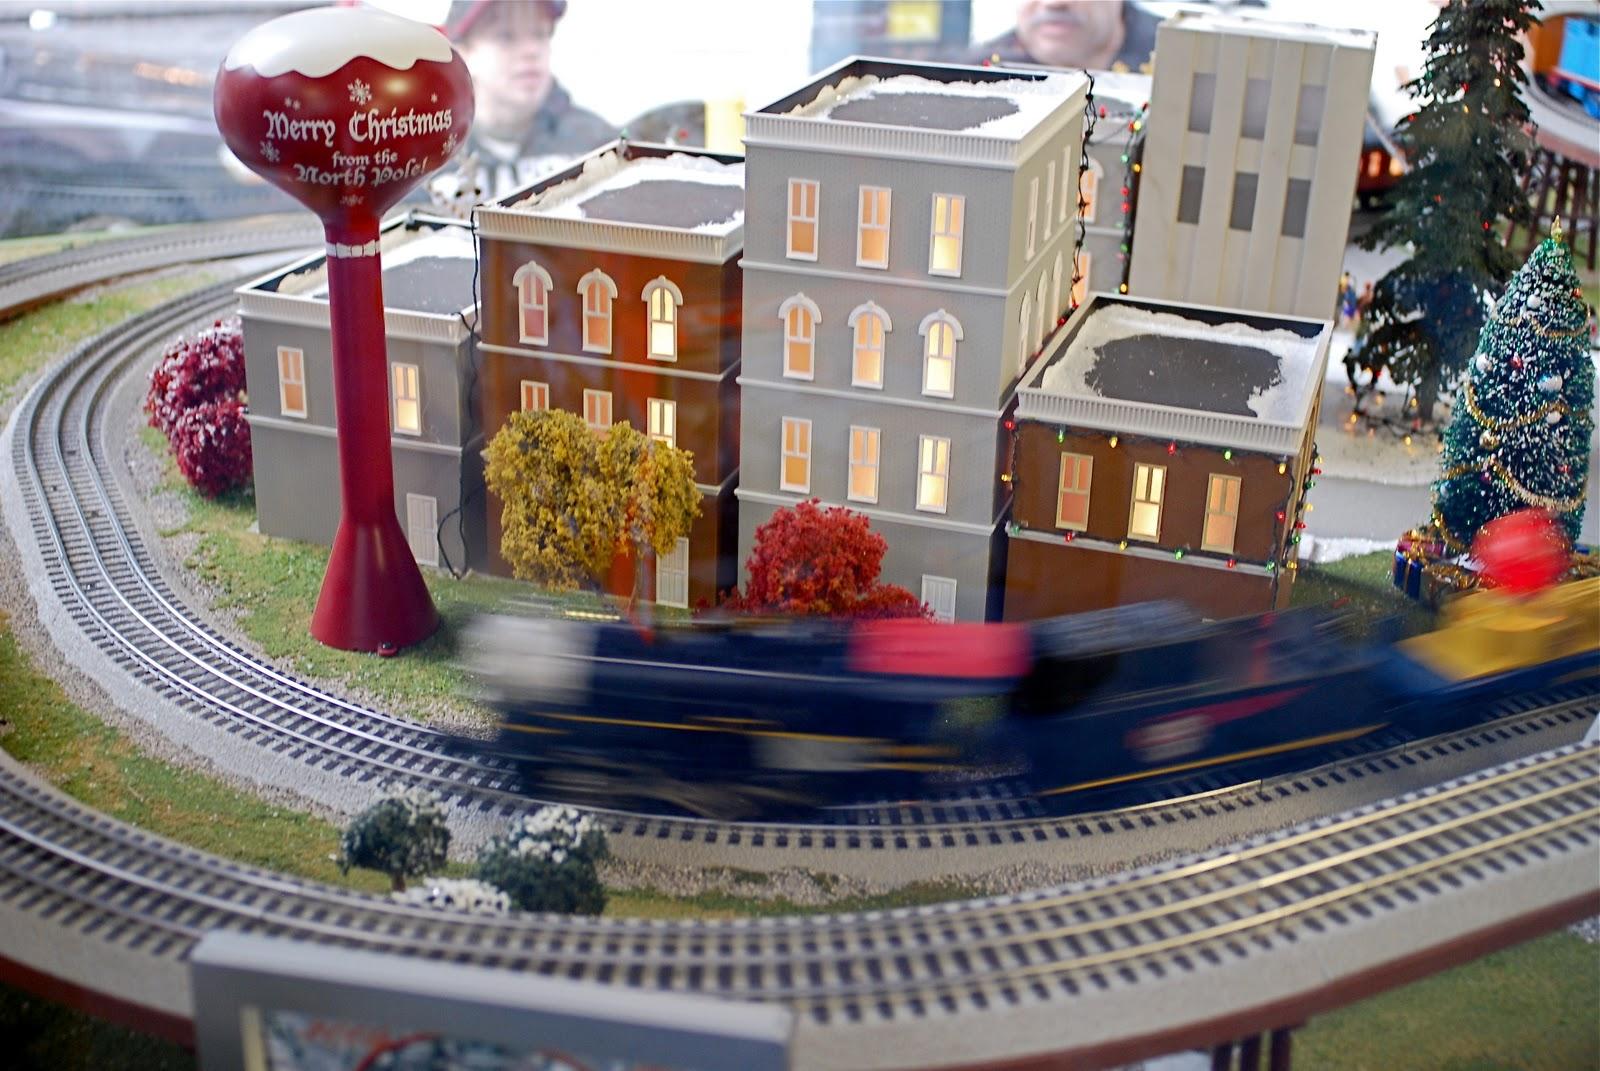 Model train store calgary 70.3